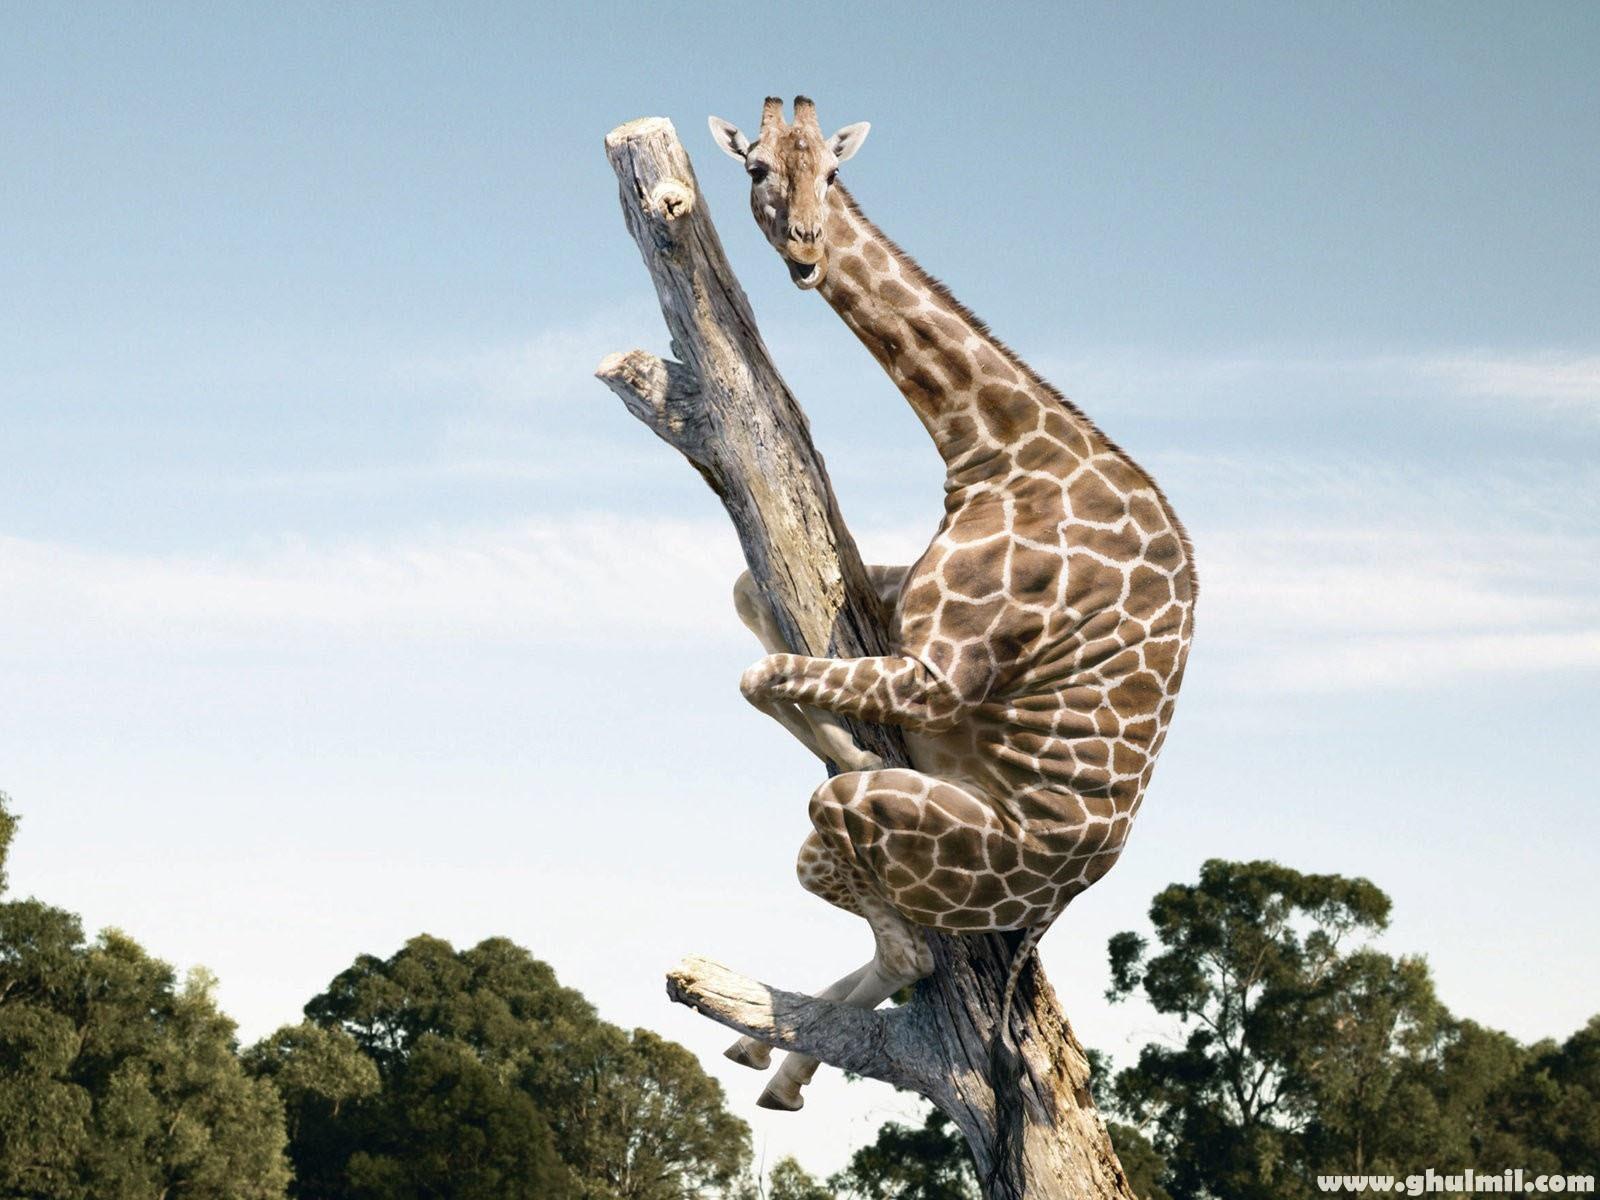 Working Giraffe Wallpapers 1600x1200